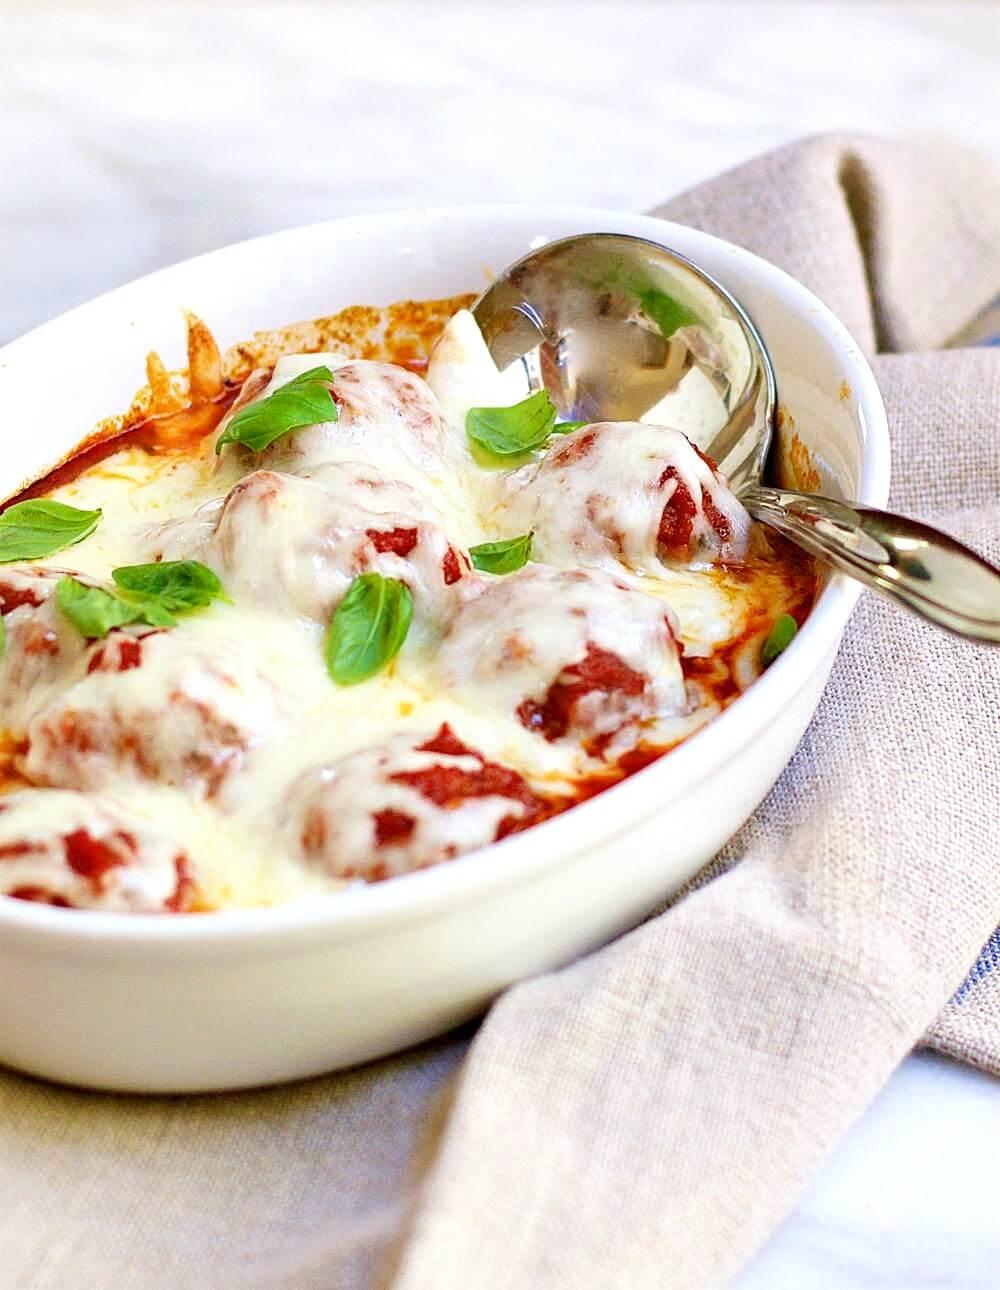 Cheesy Italian Meatballs from Pinch and Swirl